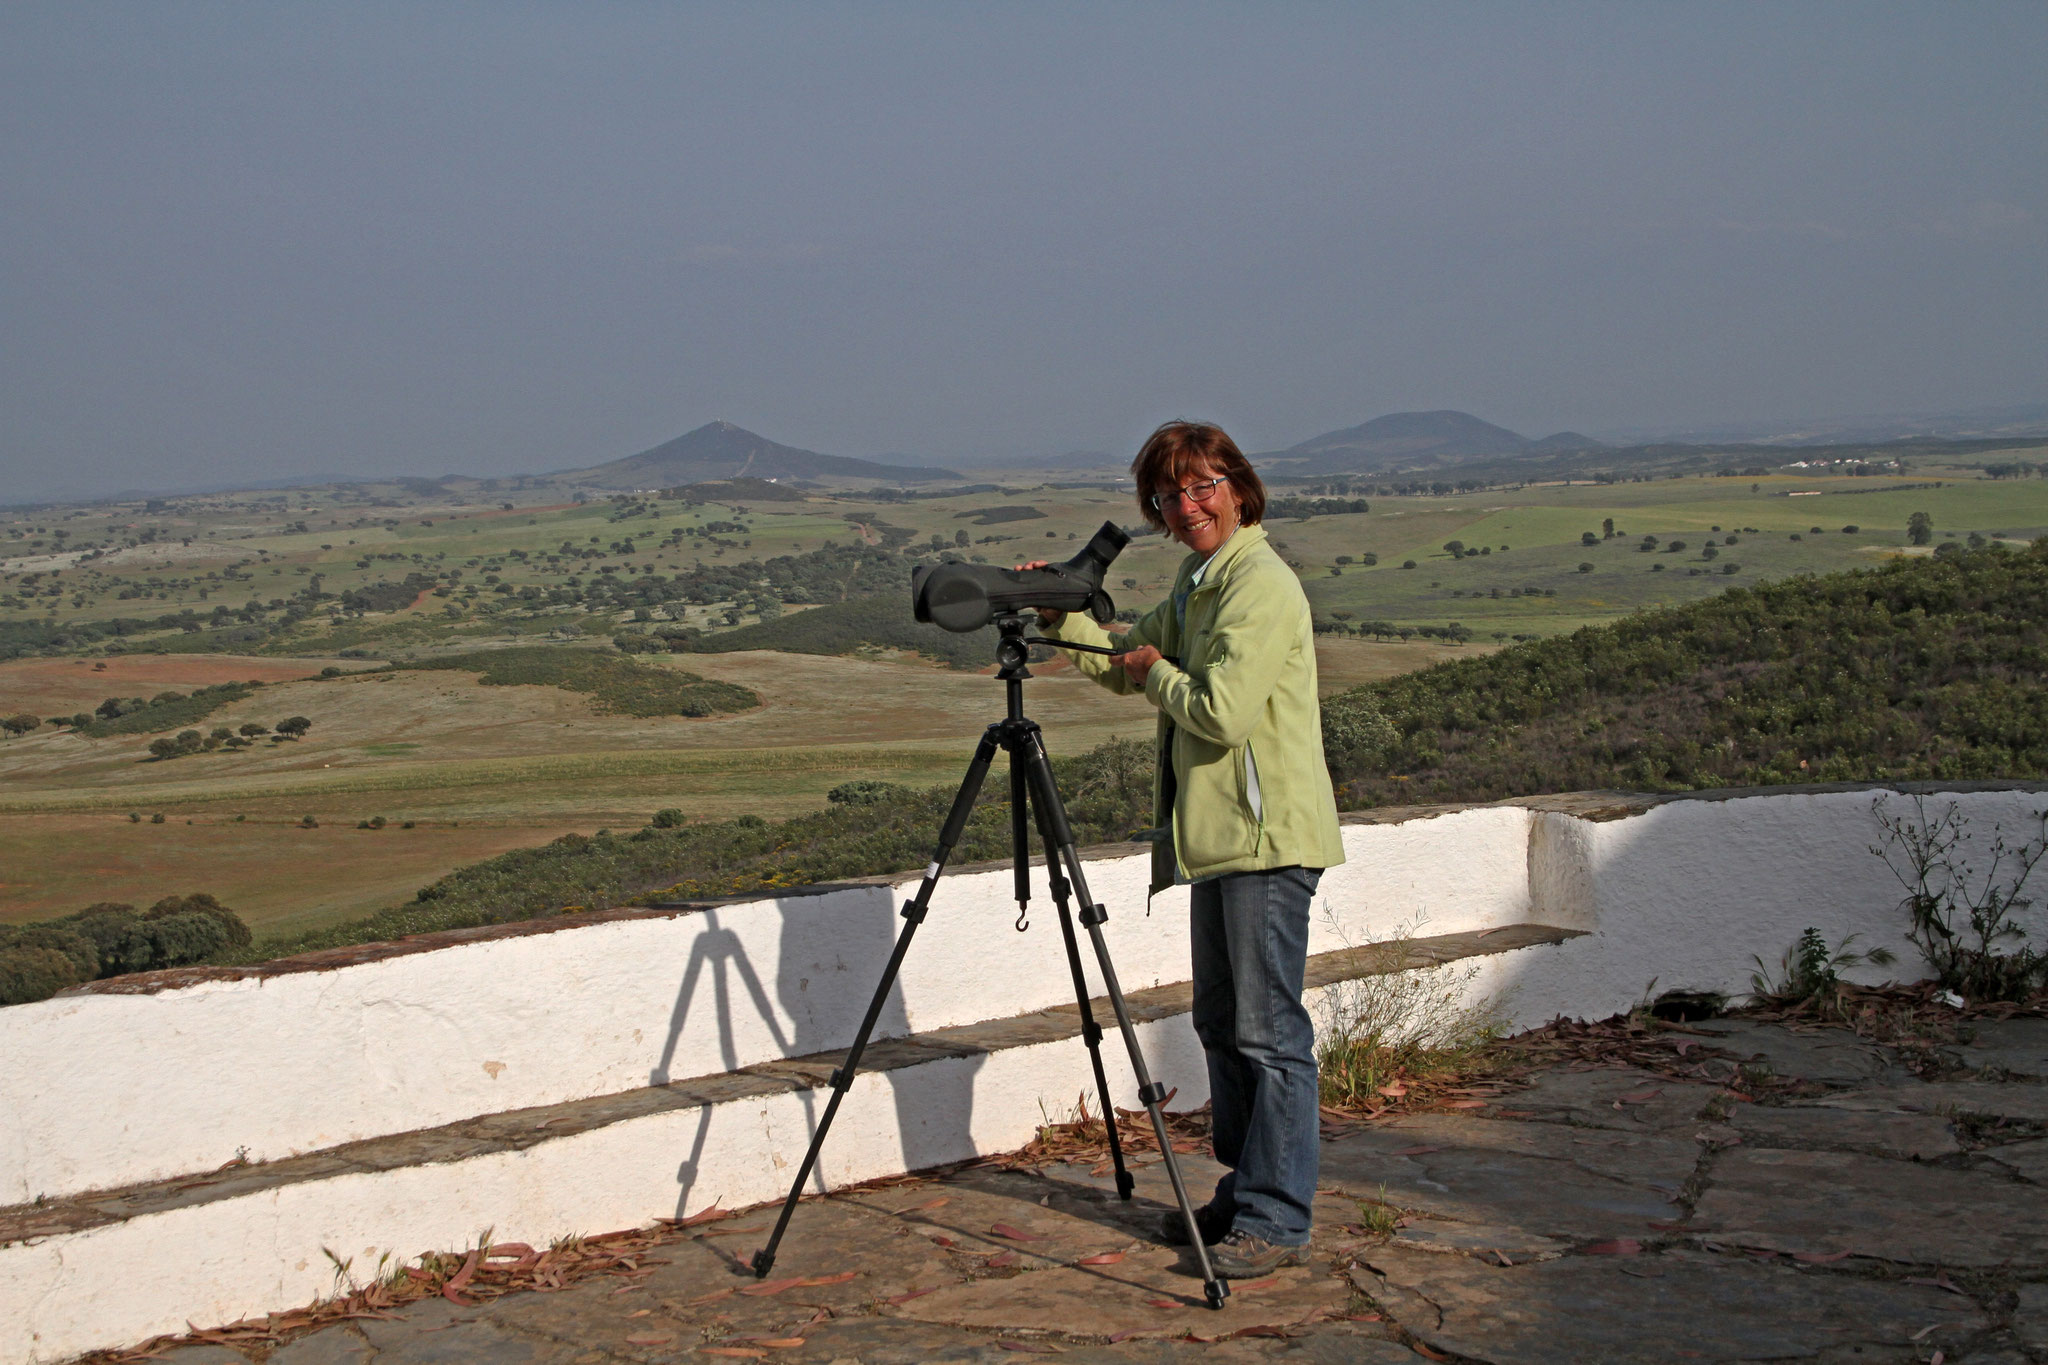 Edith bei der Greifvogelbeobachtung auf dem Kapellenhügel Nossa Senhora de Aracelis